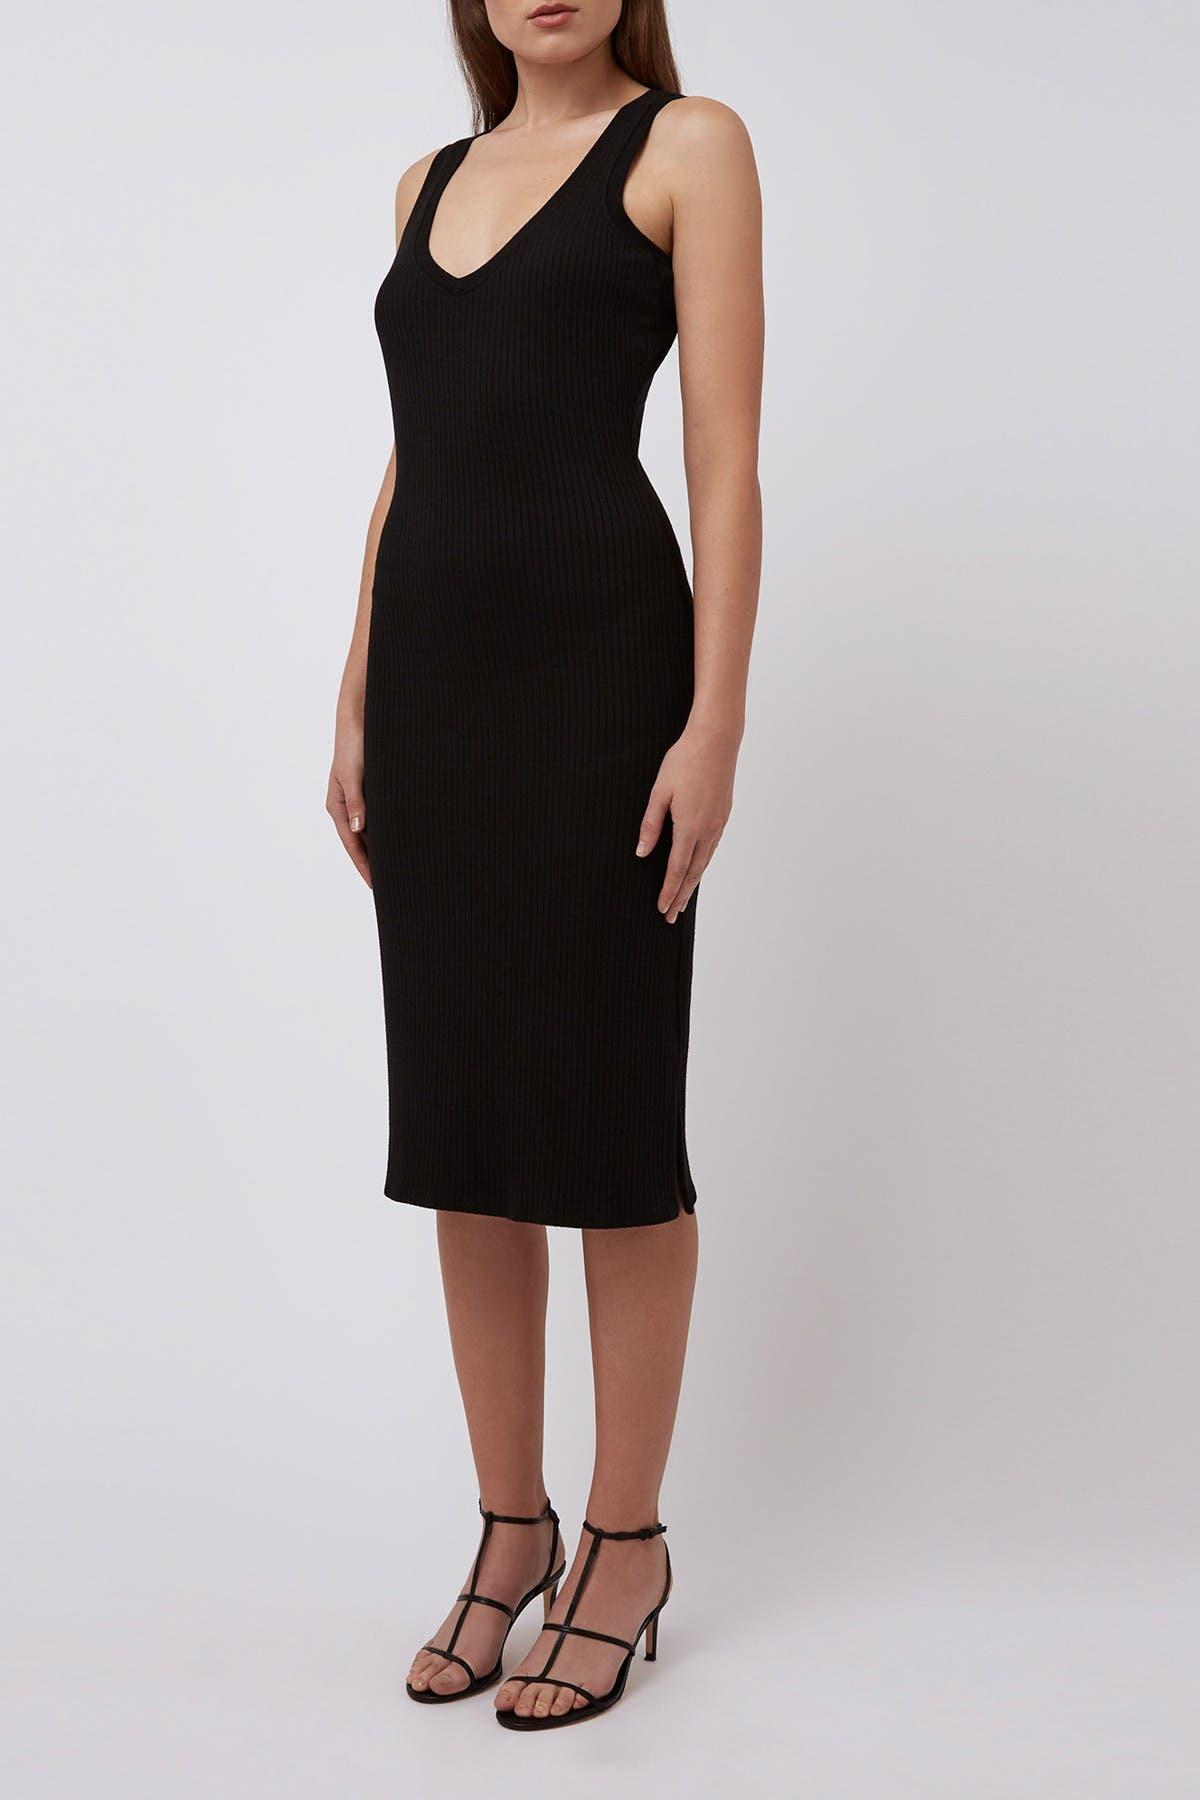 Image of BALDWIN Lyric Dress